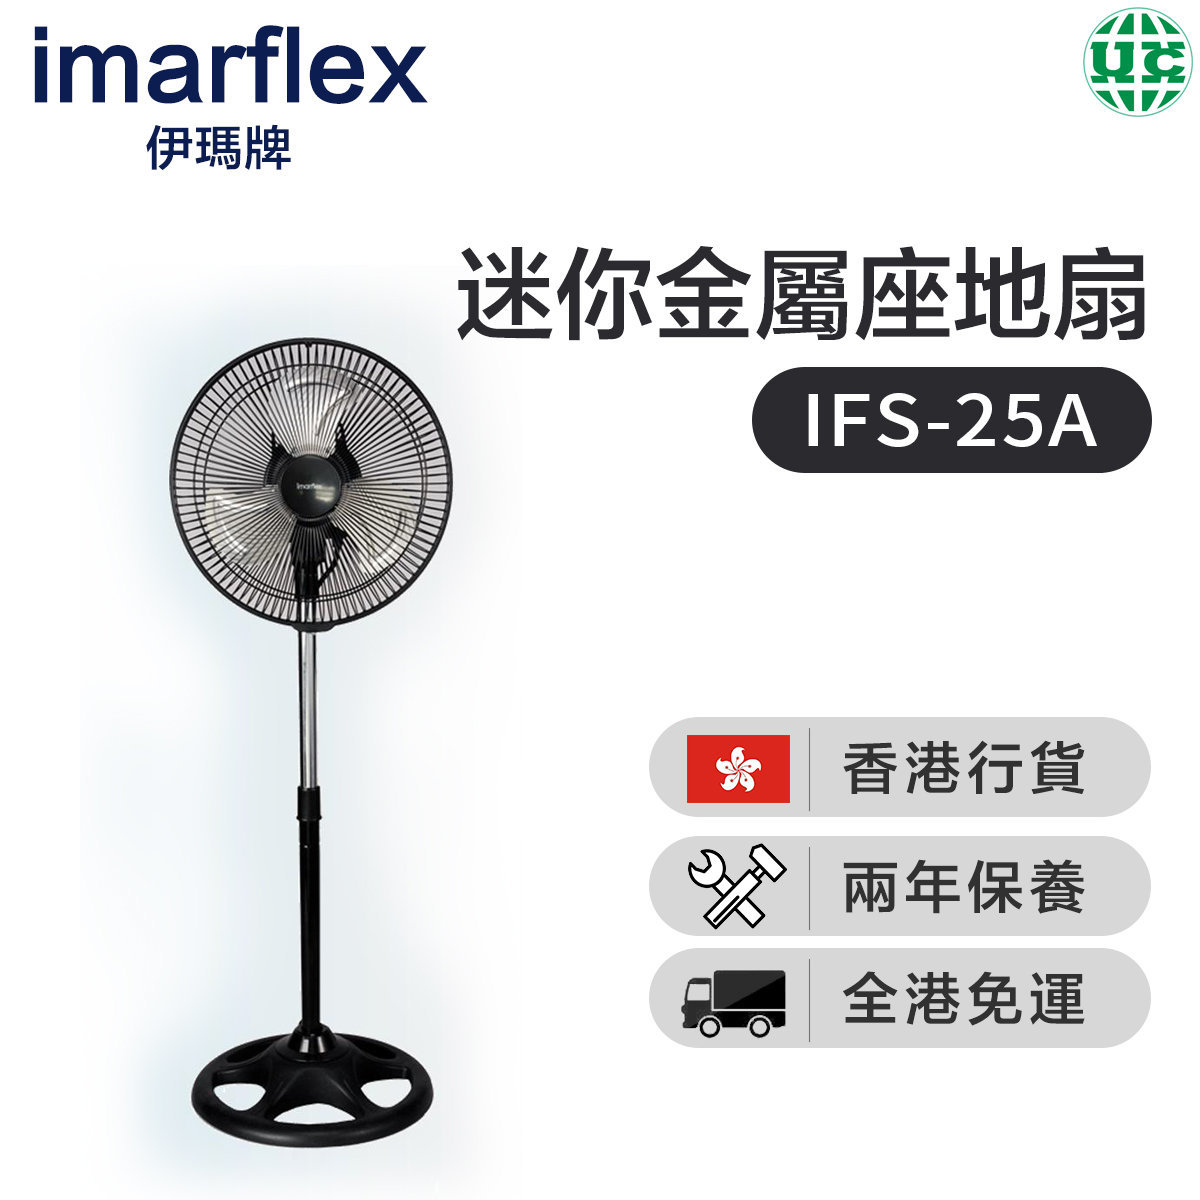 IMARFLEX IFS-25A plain steel 10 inch mini metal floor fan(Hong Kong licensed)